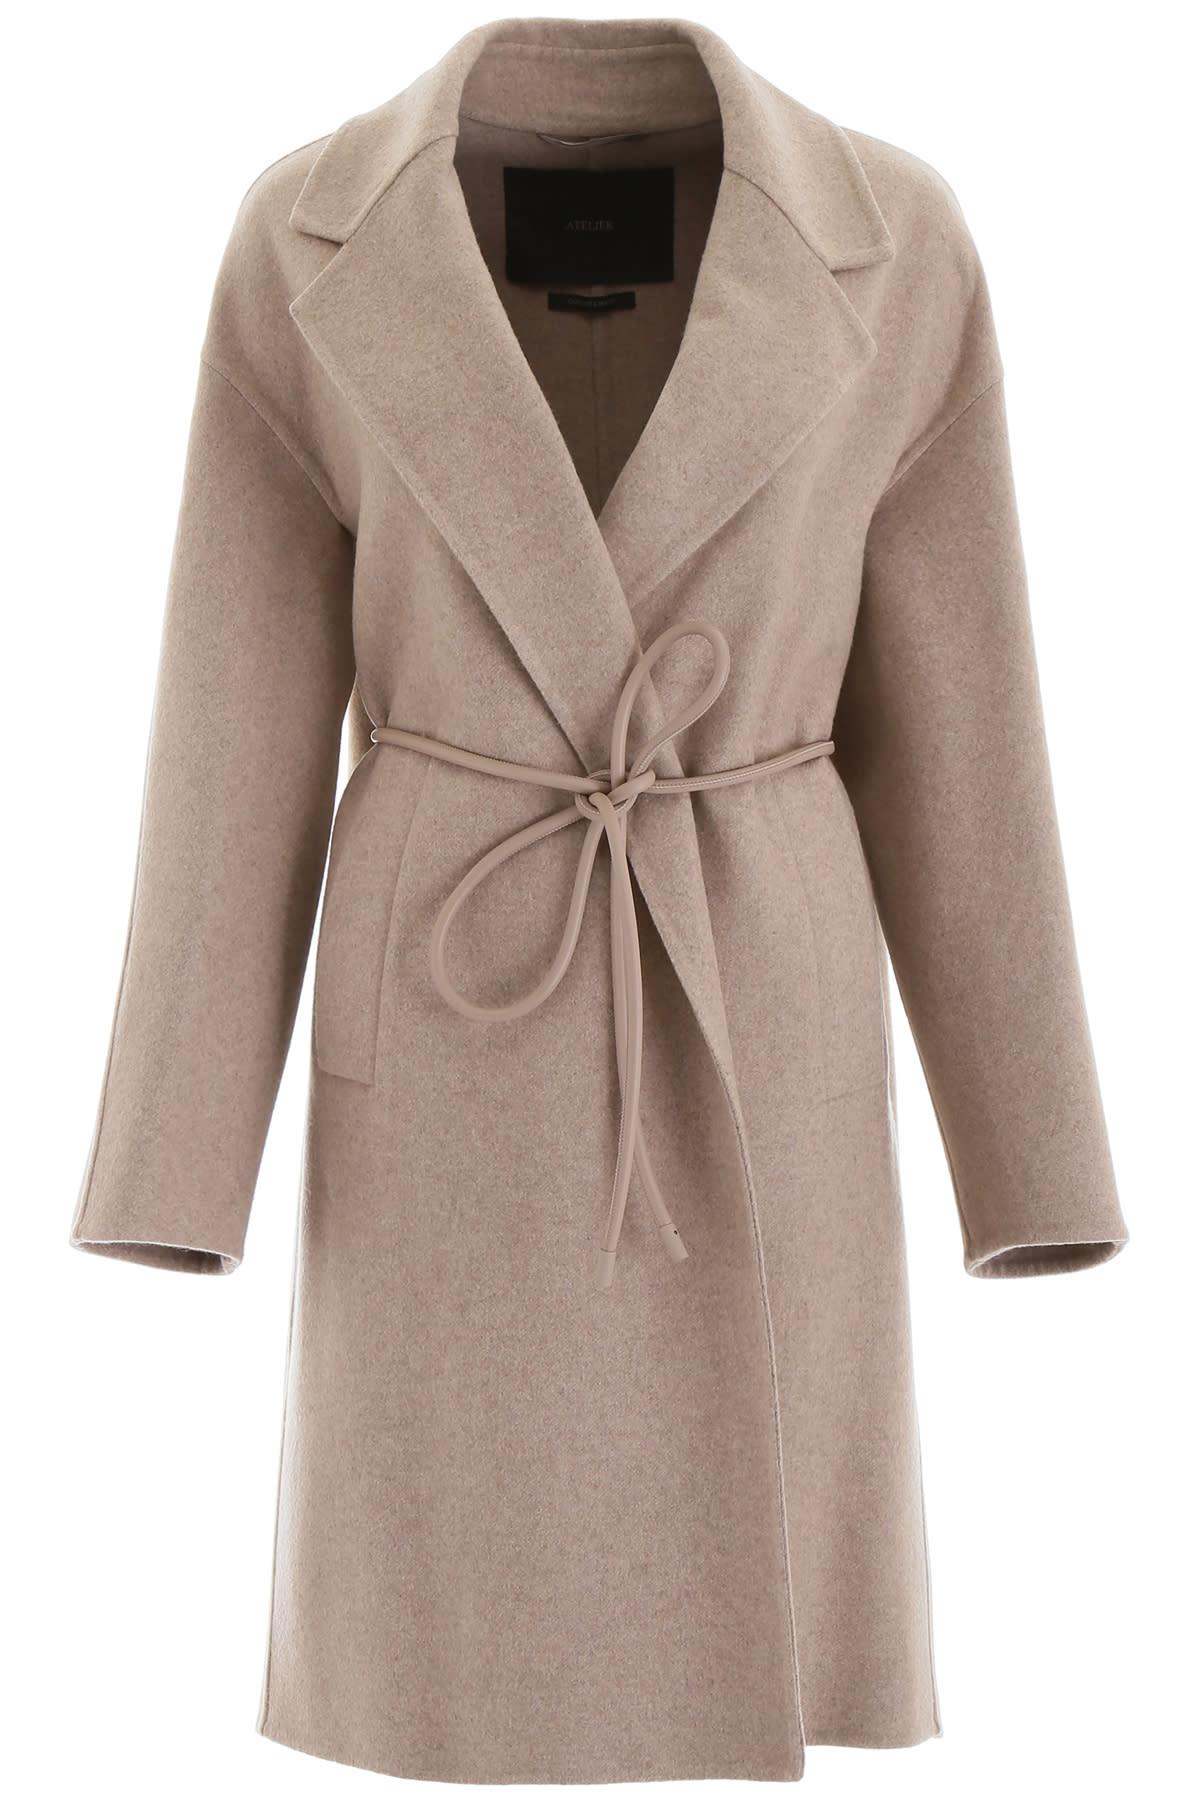 Photo of  Max Mara Atelier Plava Coat- shop Max Mara Atelier jackets online sales